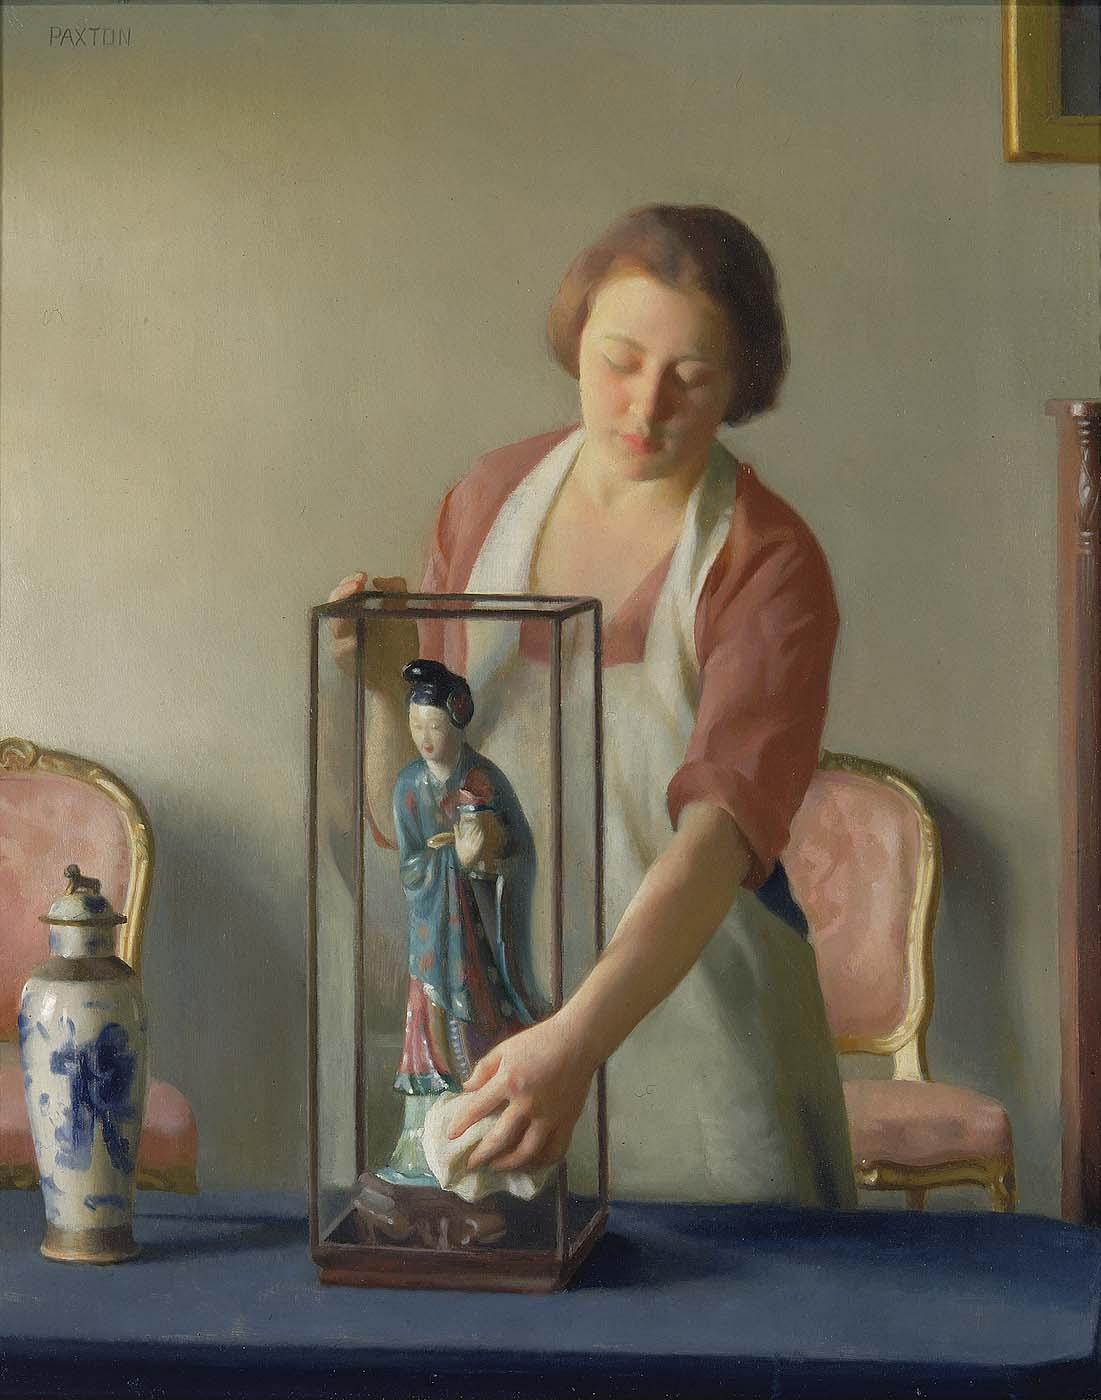 19th century American Paintings: William McGregor Paxton